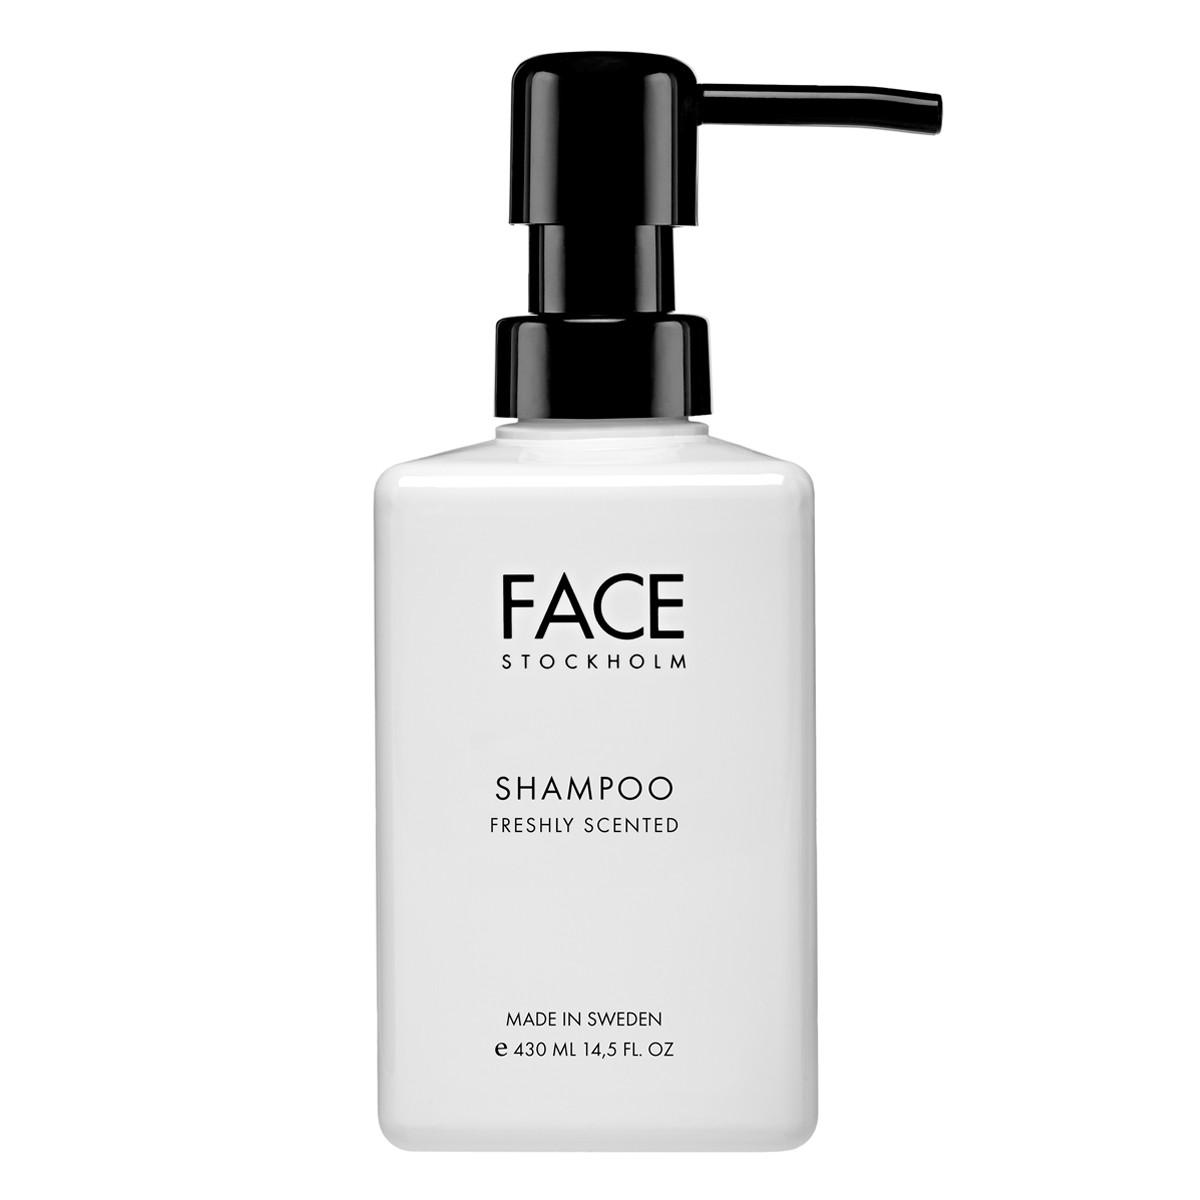 0005 FS 950 050 Shampoo